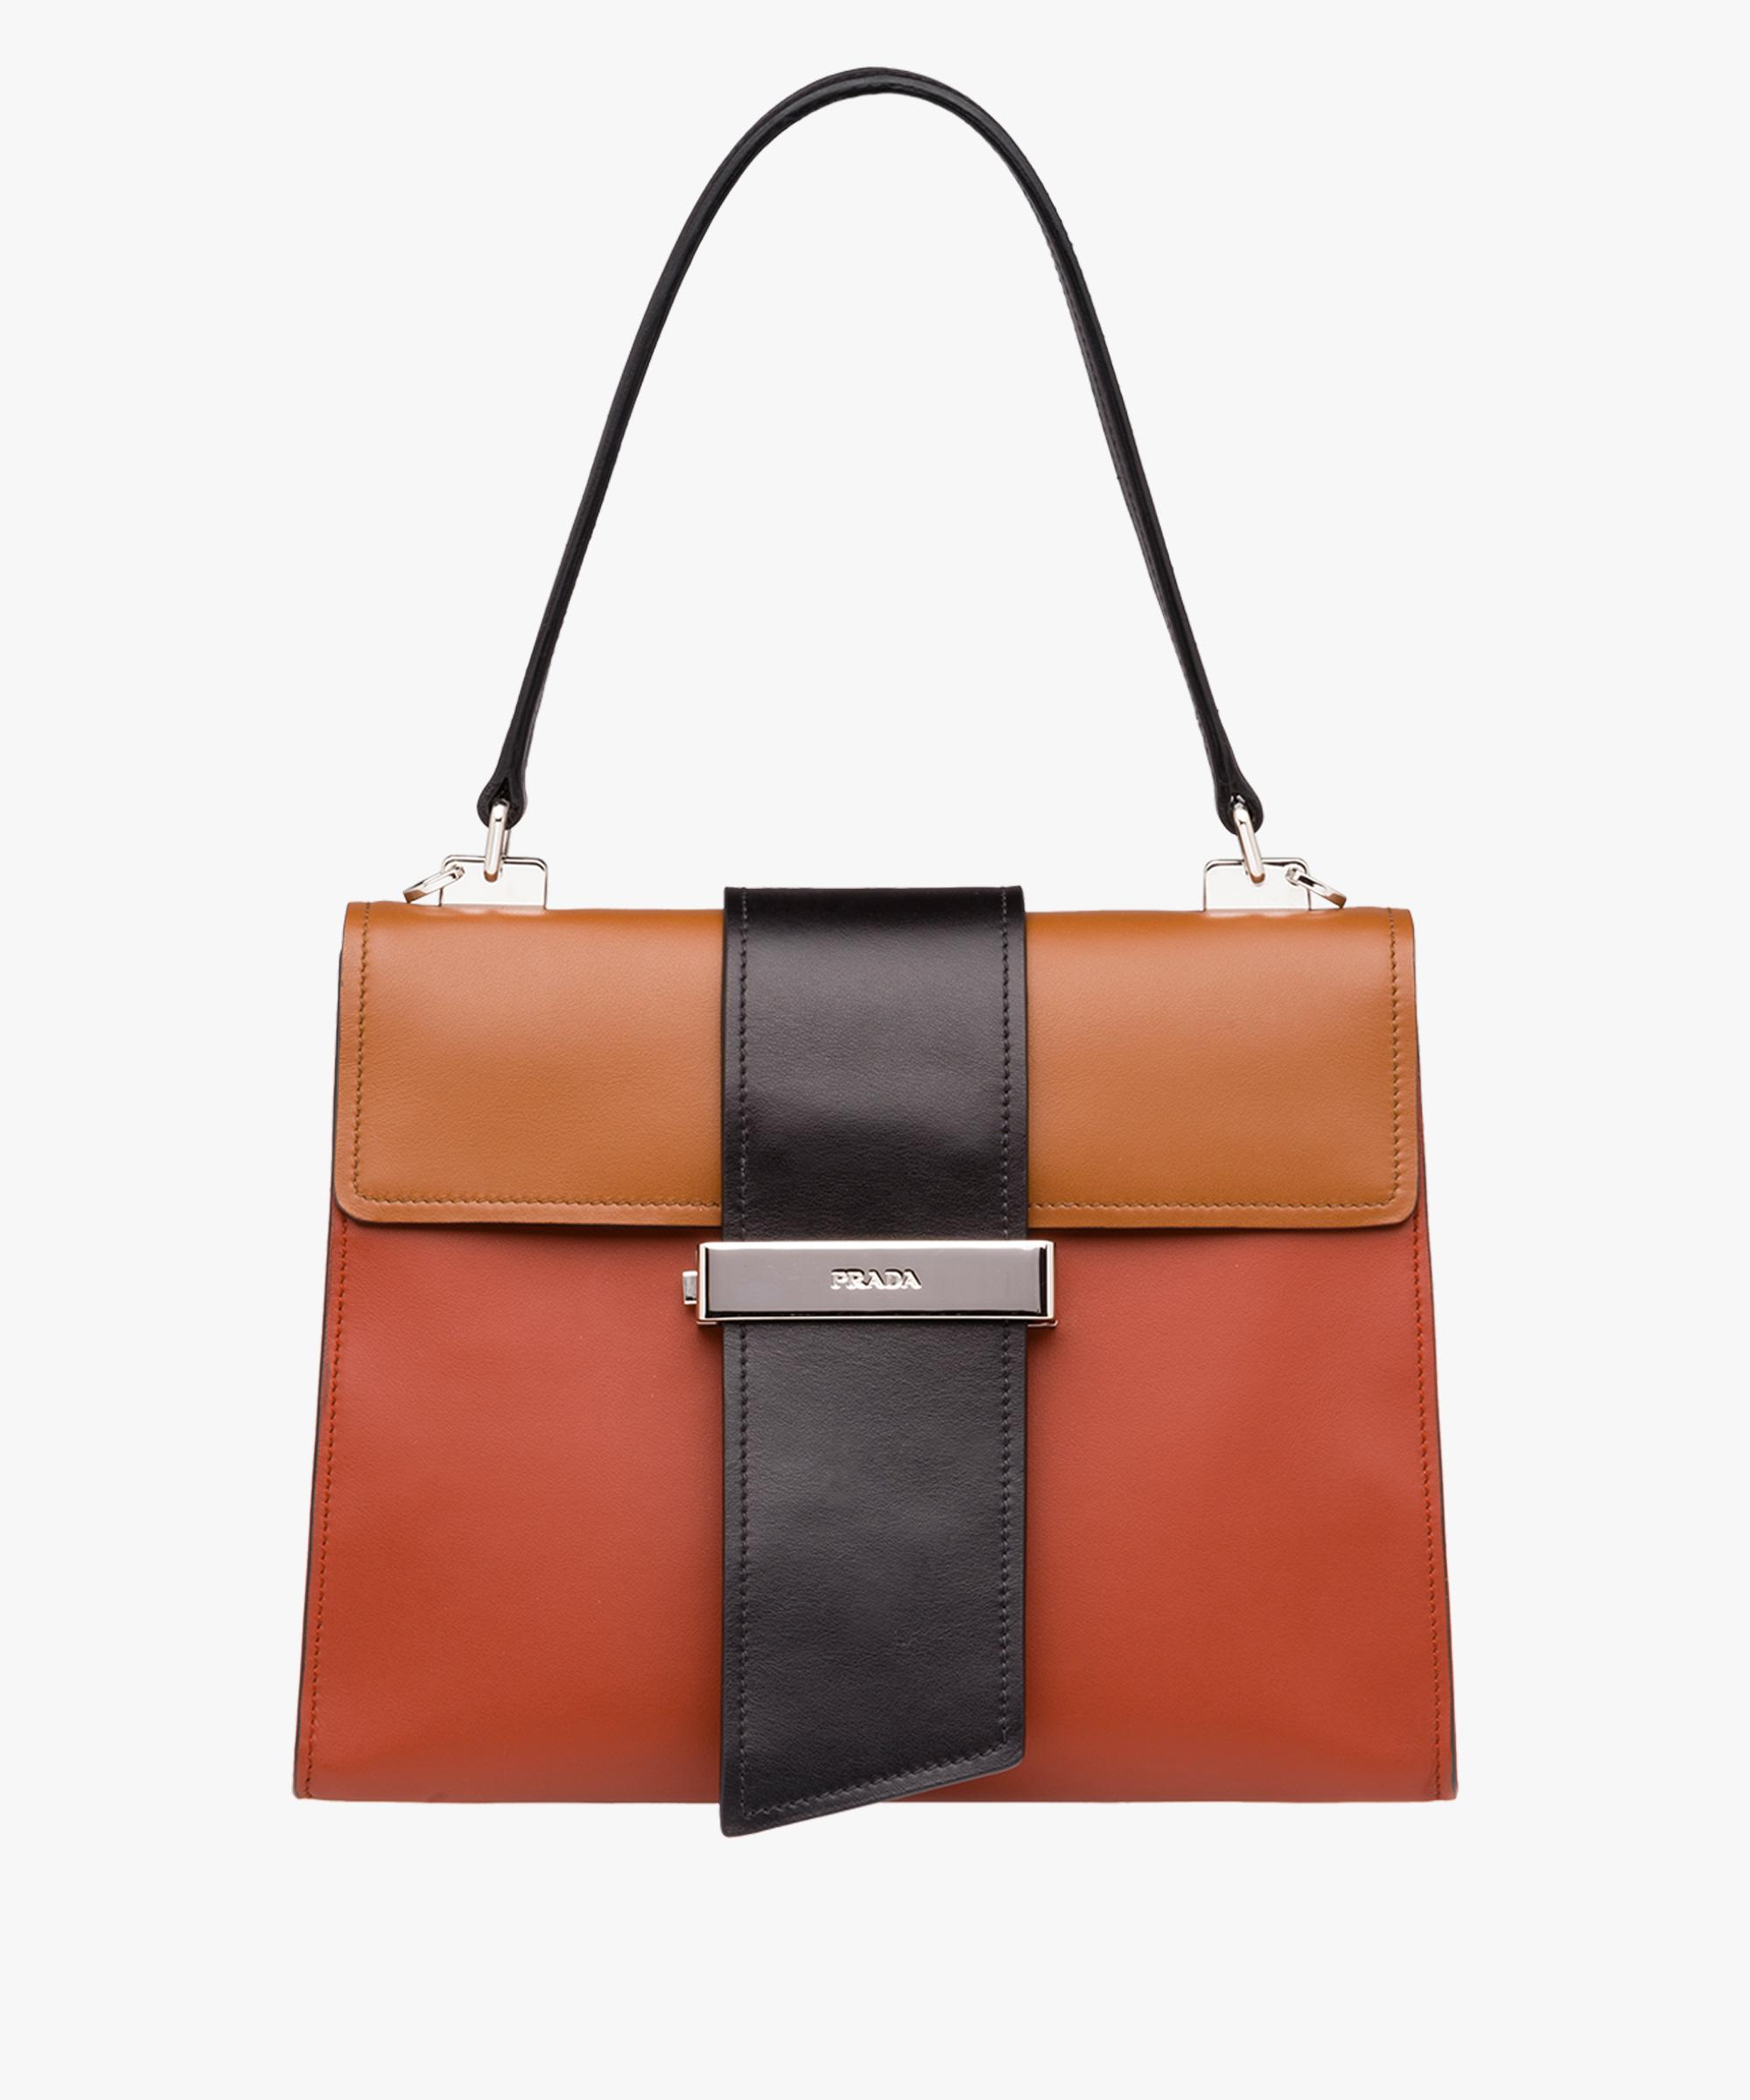 19822157f20b Lyst - Prada Metal Ribbon Leather Shoulder Bag in Black